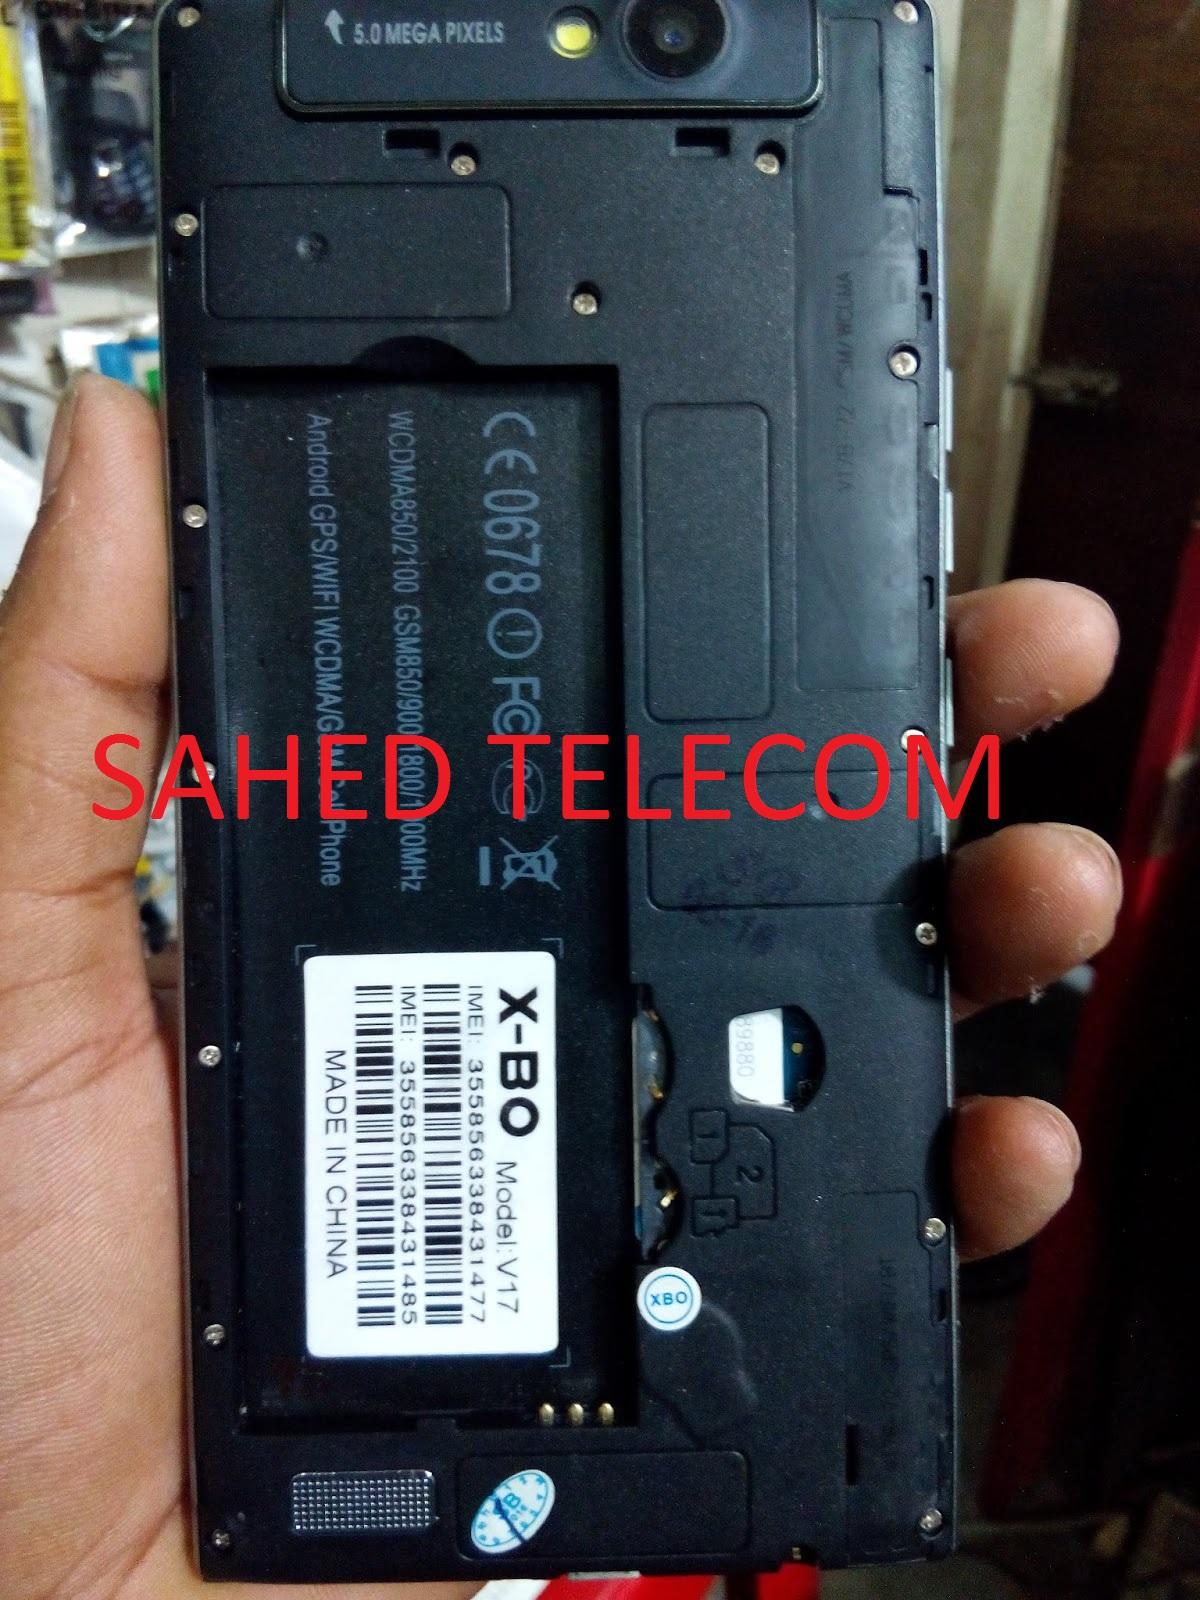 SAHED TELECOM: SONY X-BO V17 4 4 2 MT6572 FIRMWARE FLASH